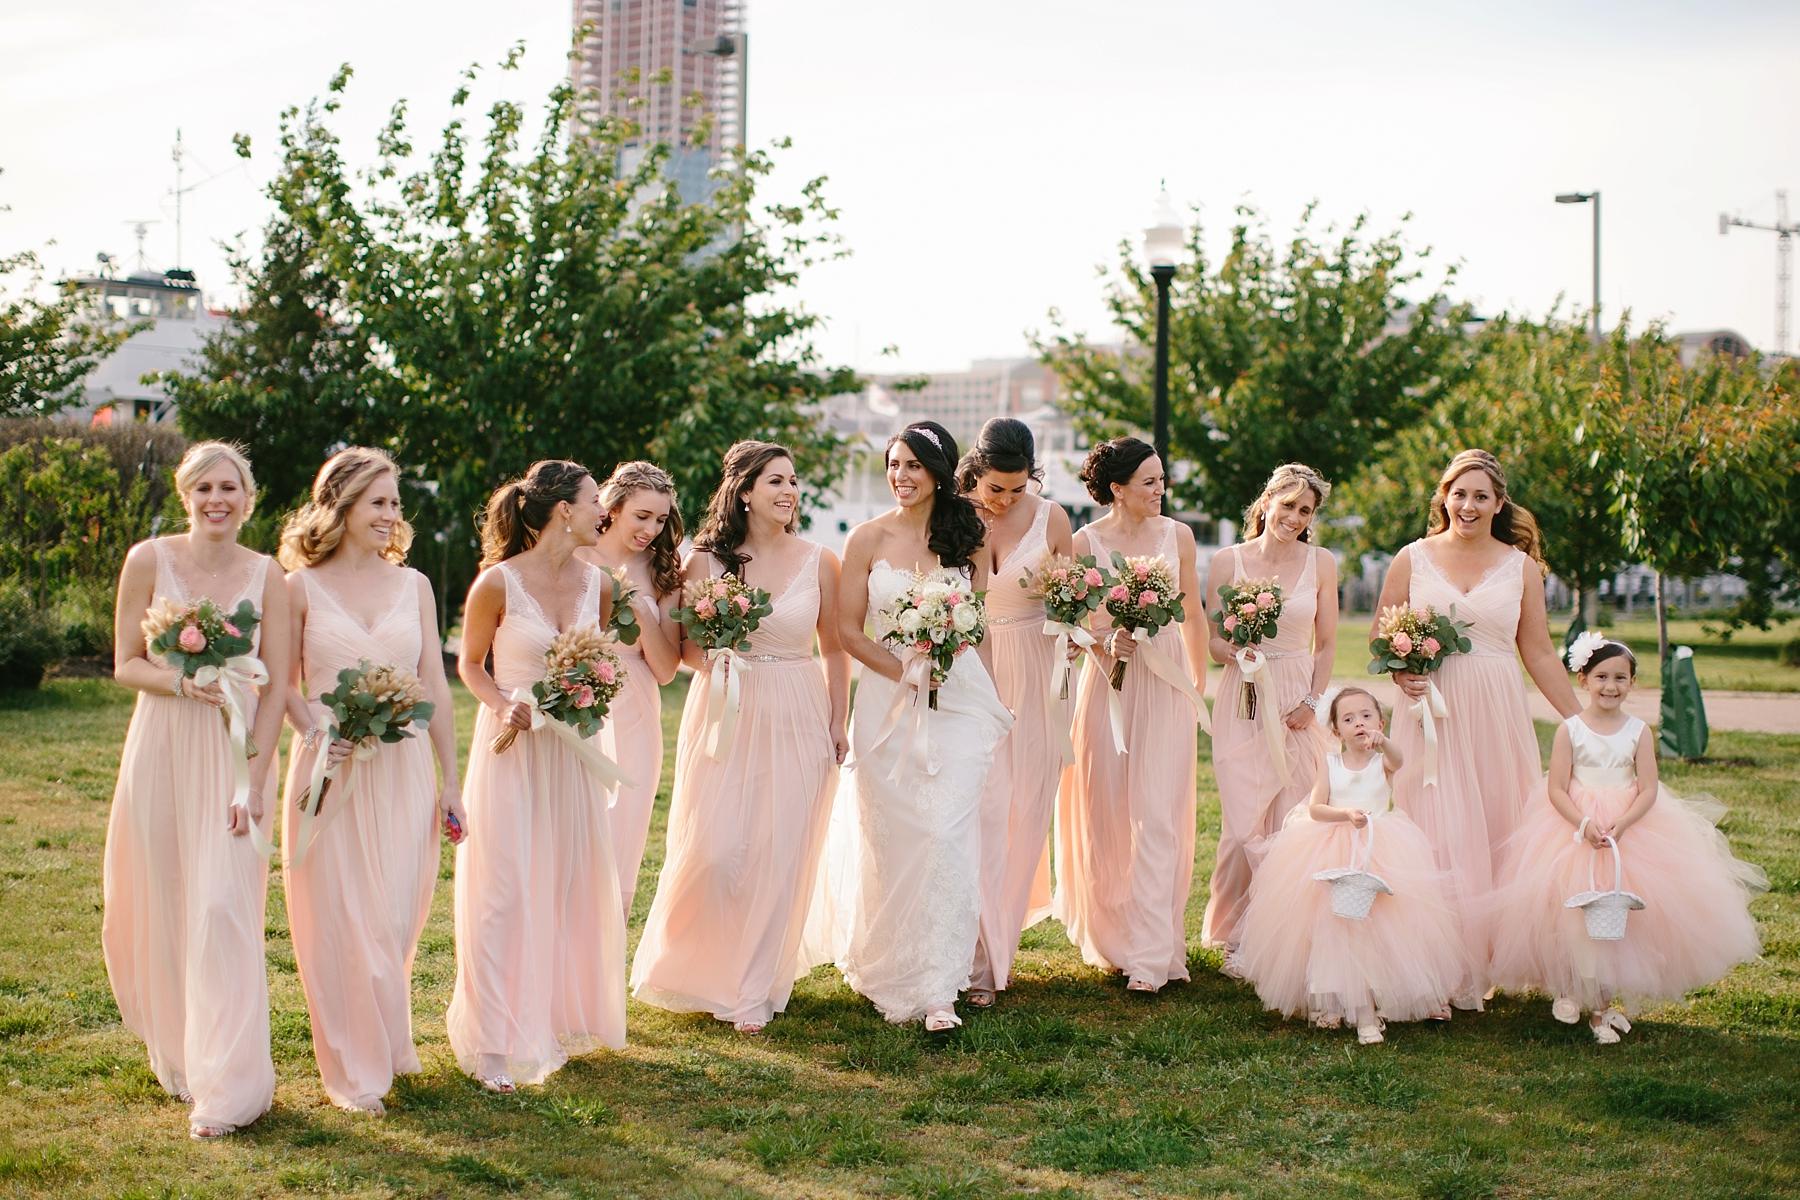 liberty-state-park-wedding-photographer-ny-nj_0024.jpg